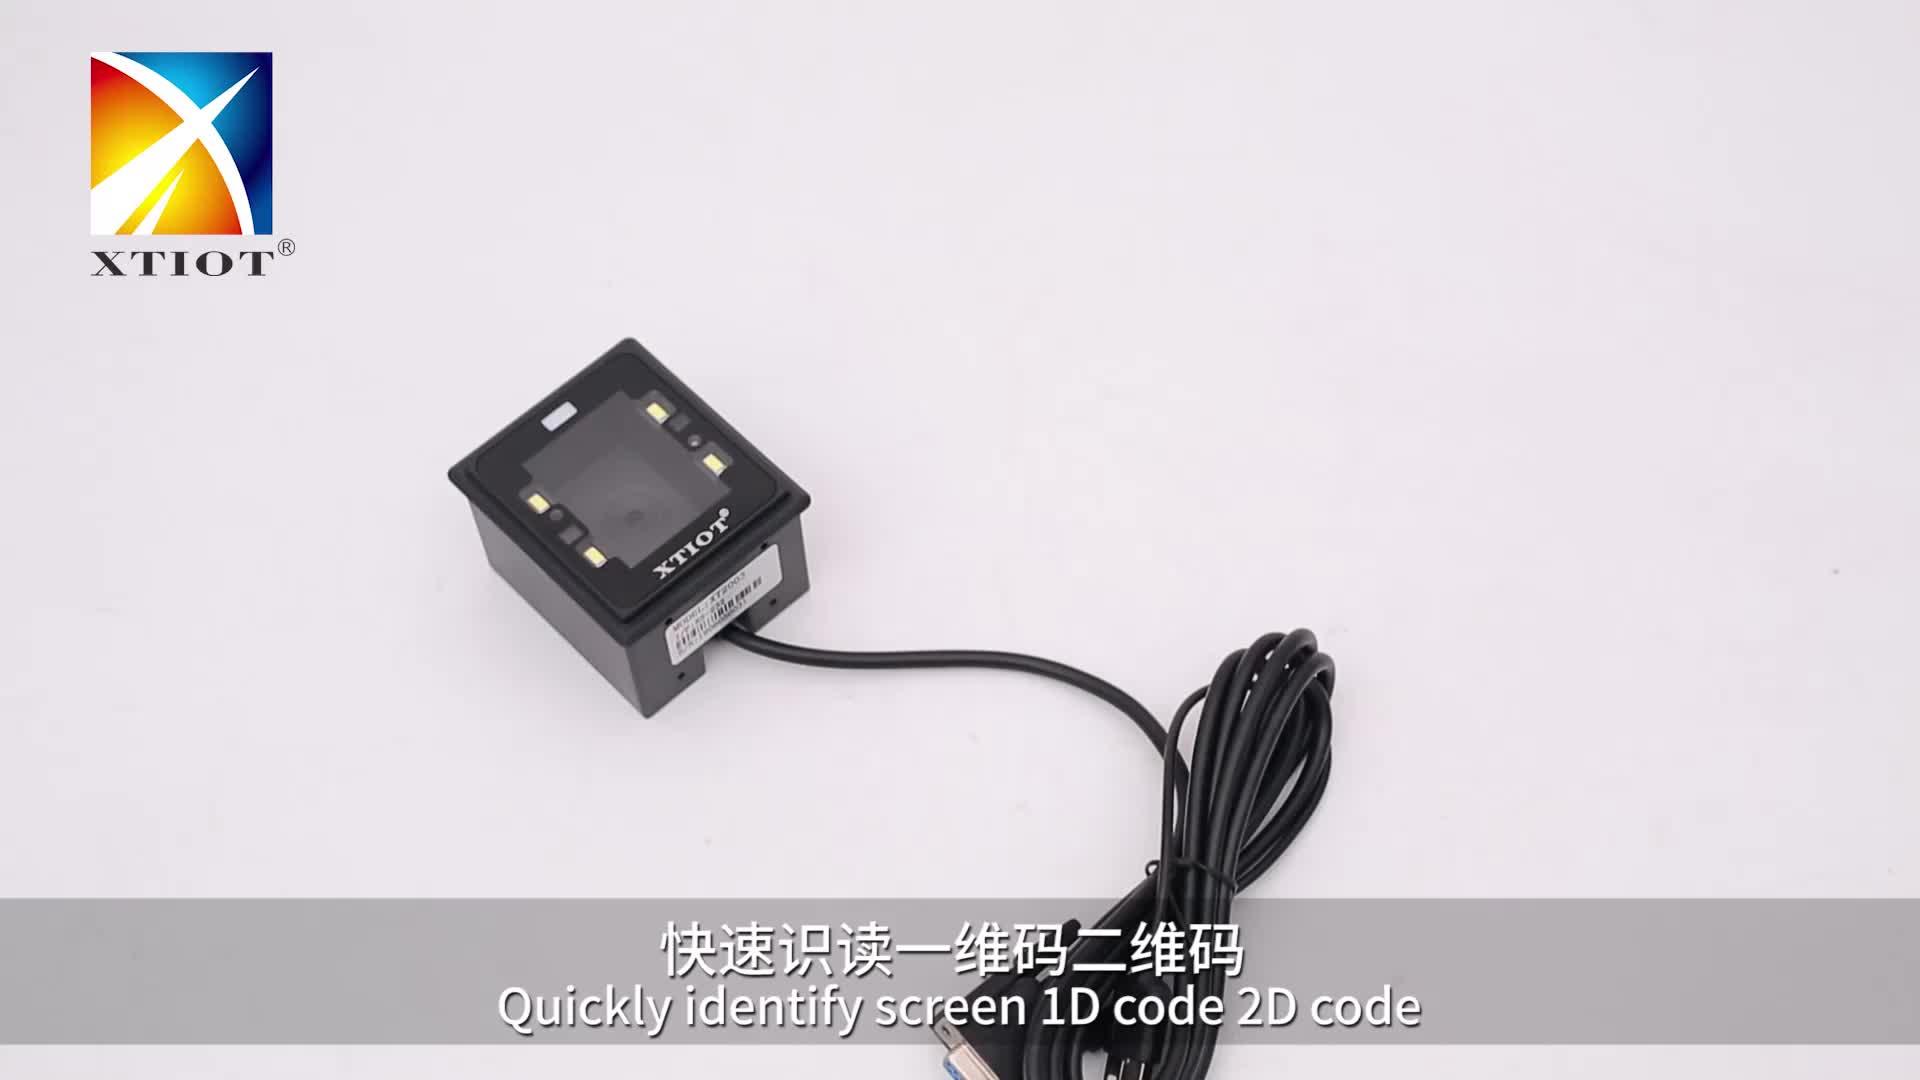 XT2011 XTIOT Robusto Fixo Montar 1D 2D QR Barcode Scanner de Código De Auto Scanner de código de Barras de Digitalização QR Para Fechadura Da Porta de Acesso sistema de controle